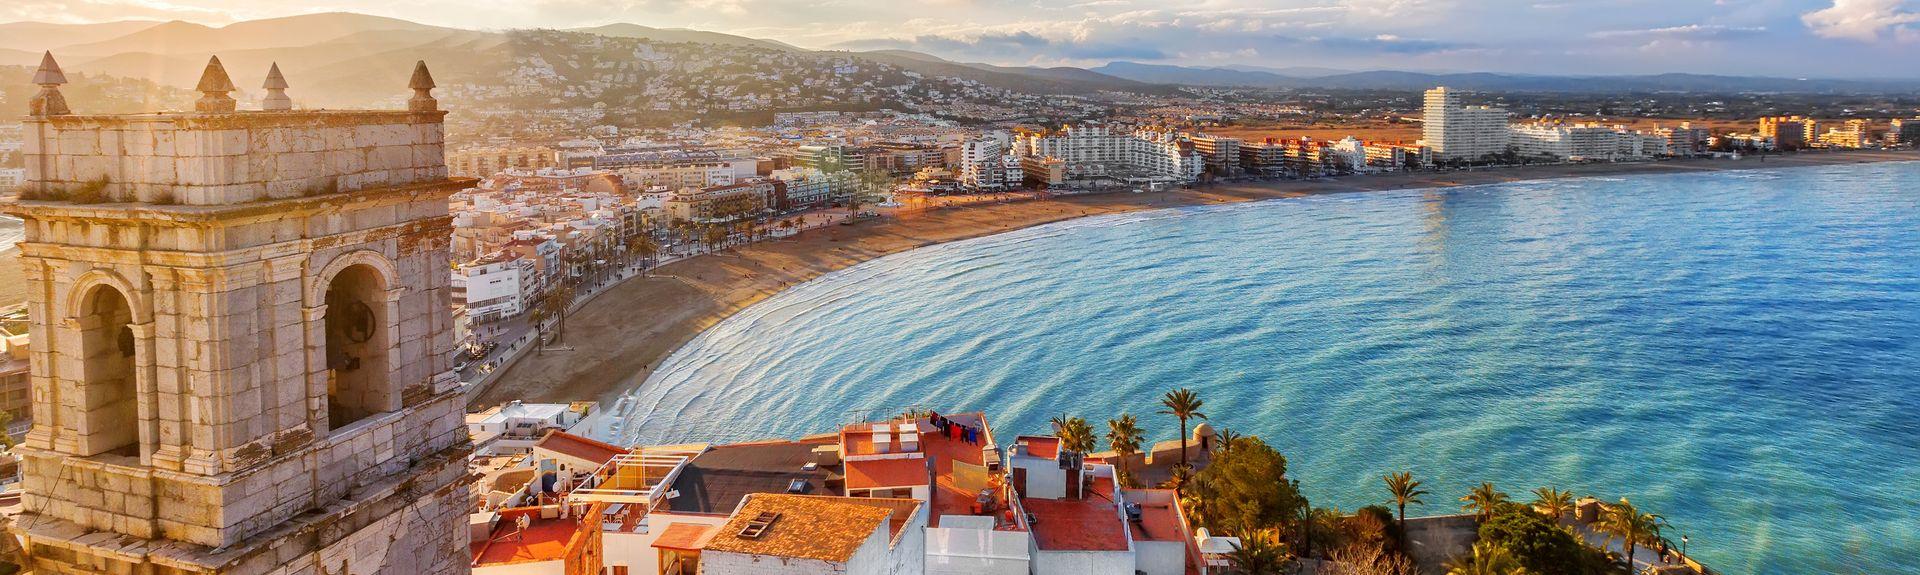 Valencia (provins), Regionen Valencia, Spanien